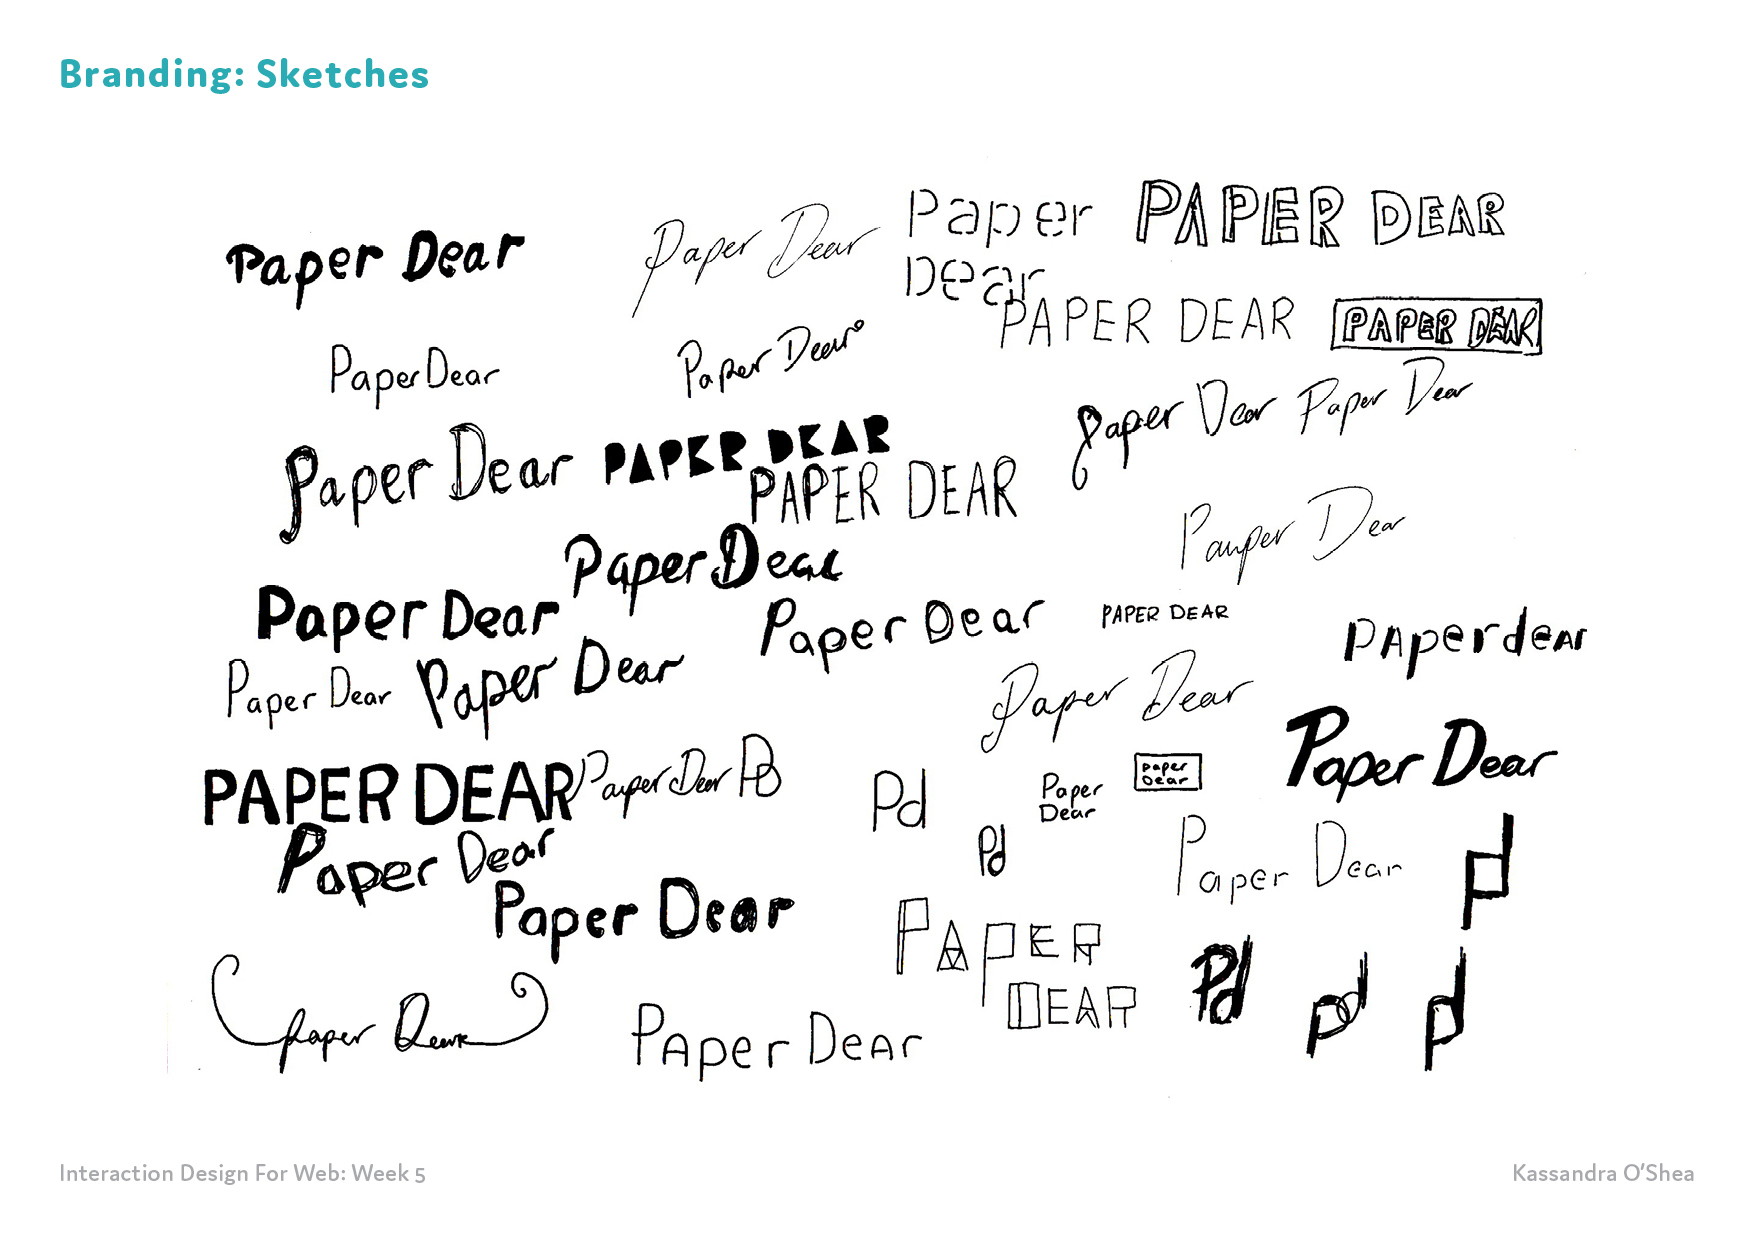 Branding: Sketches